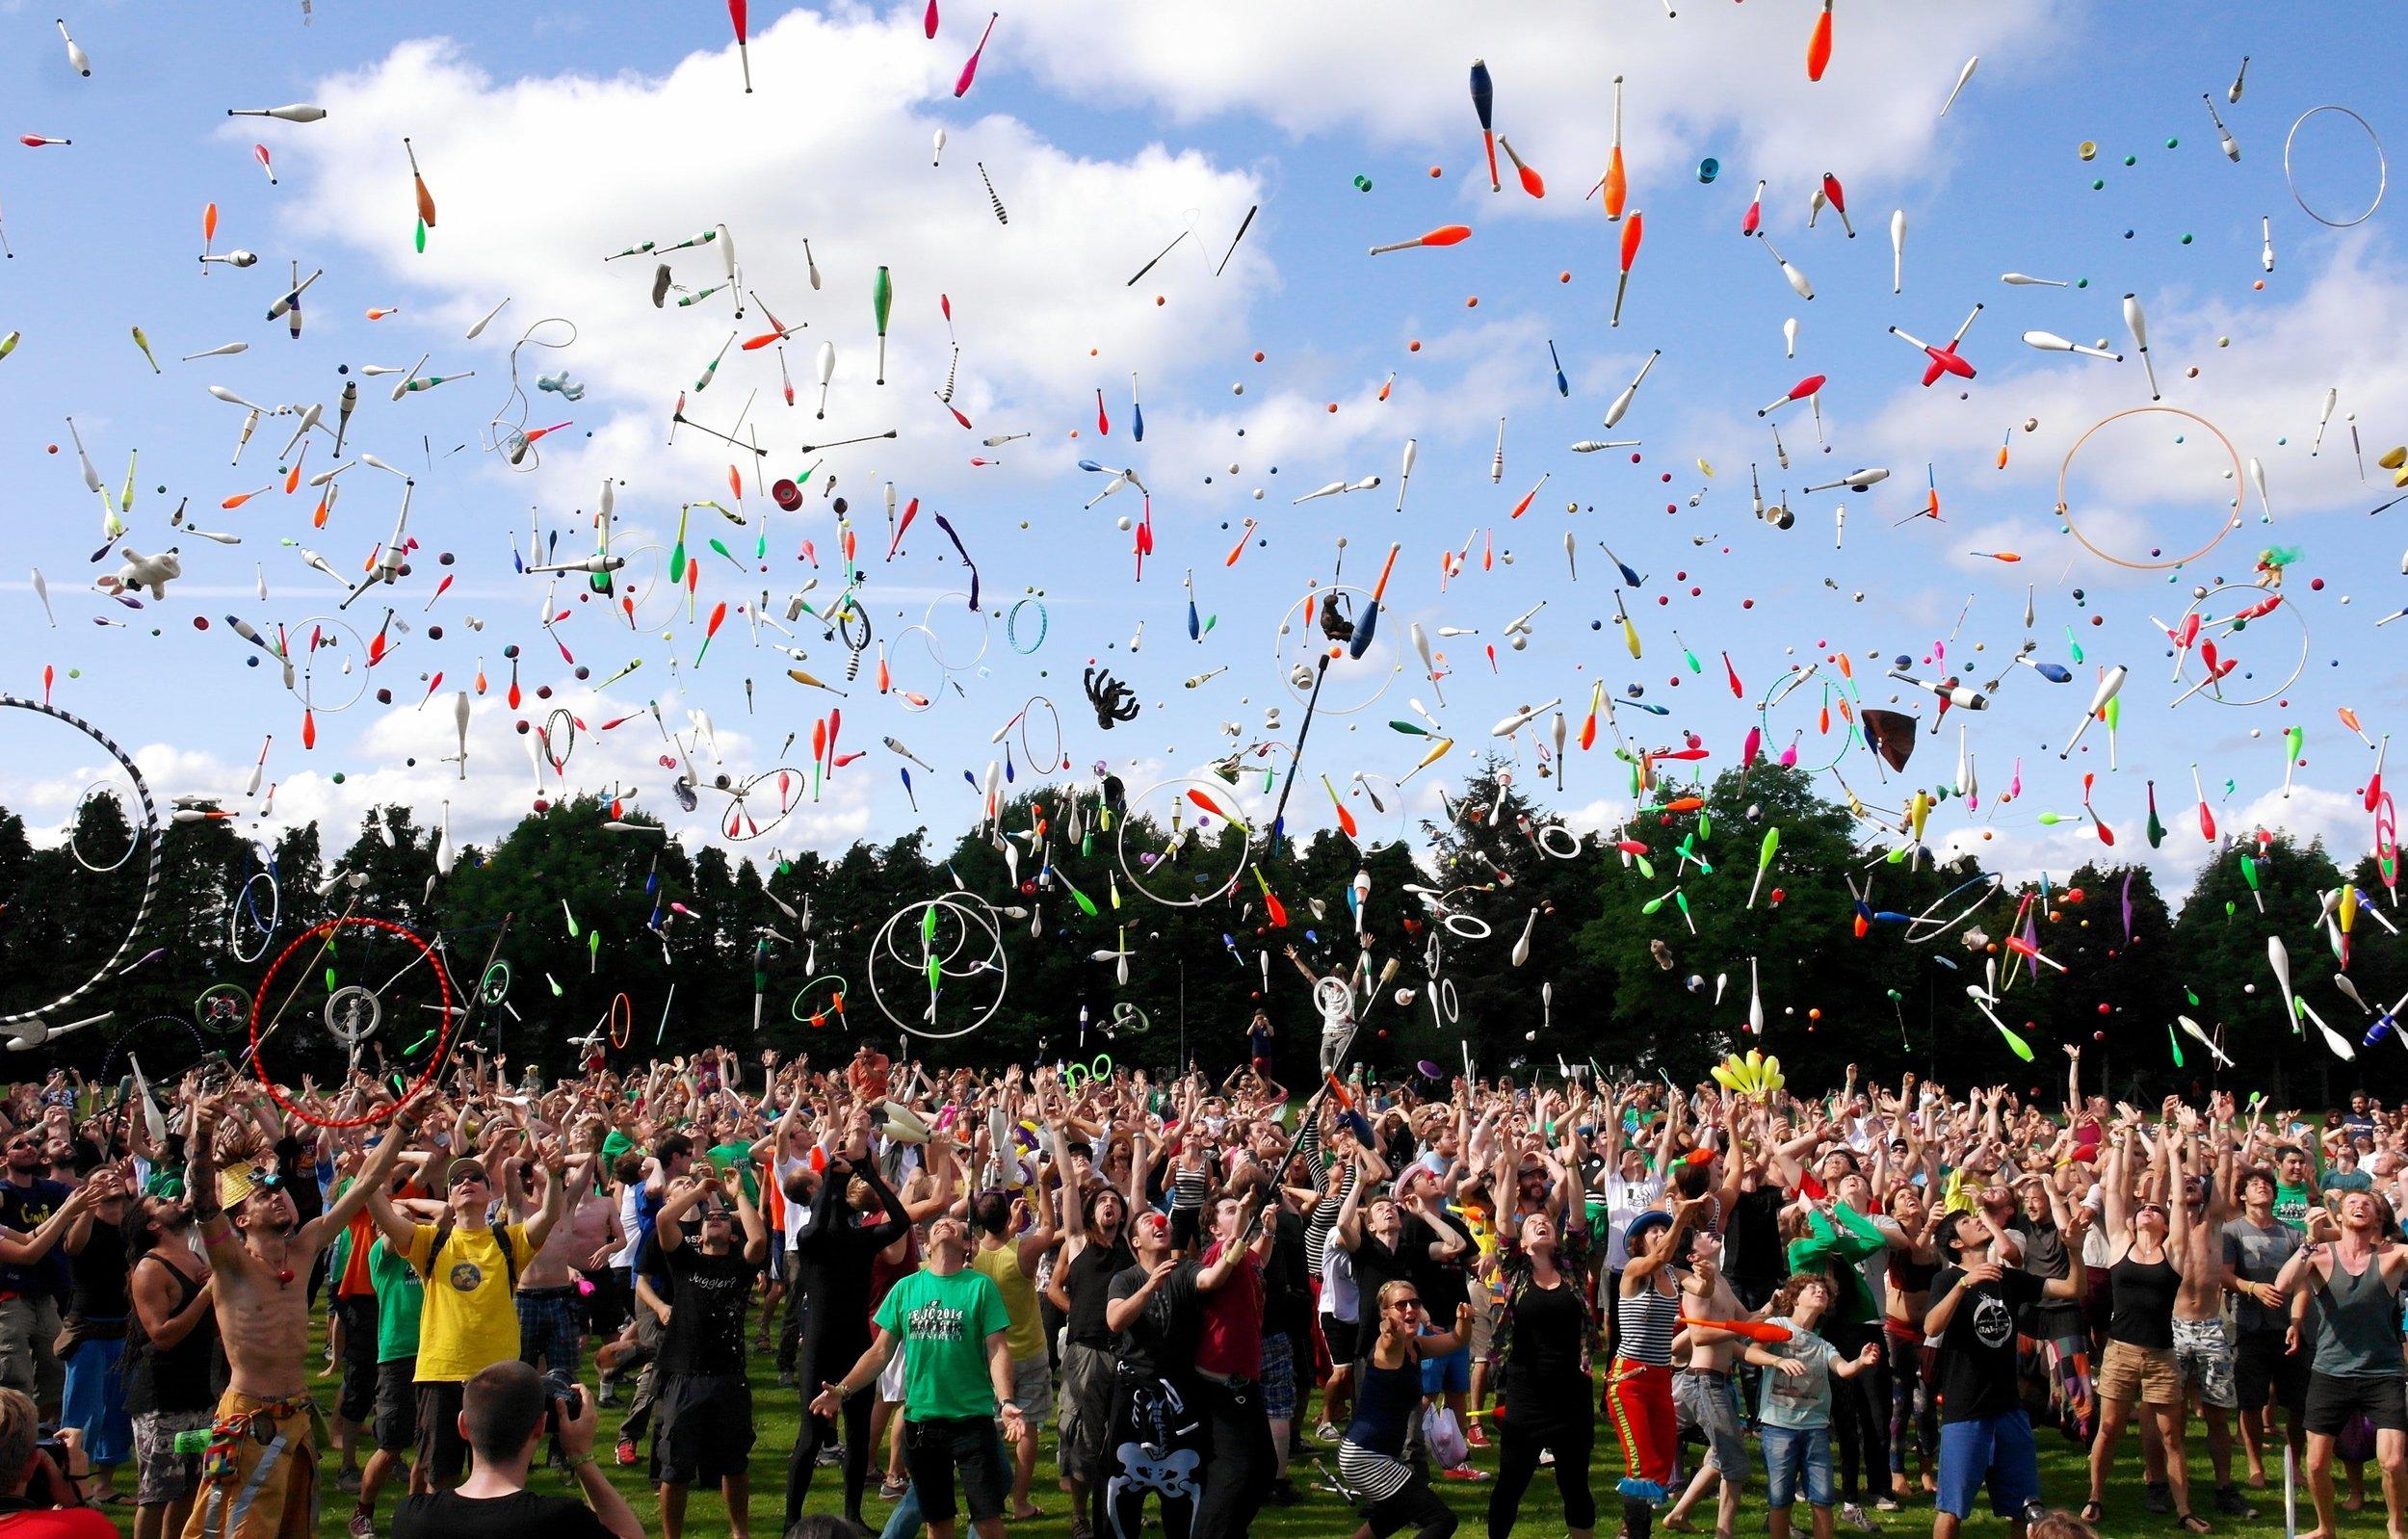 action-adults-celebration-433452.jpg